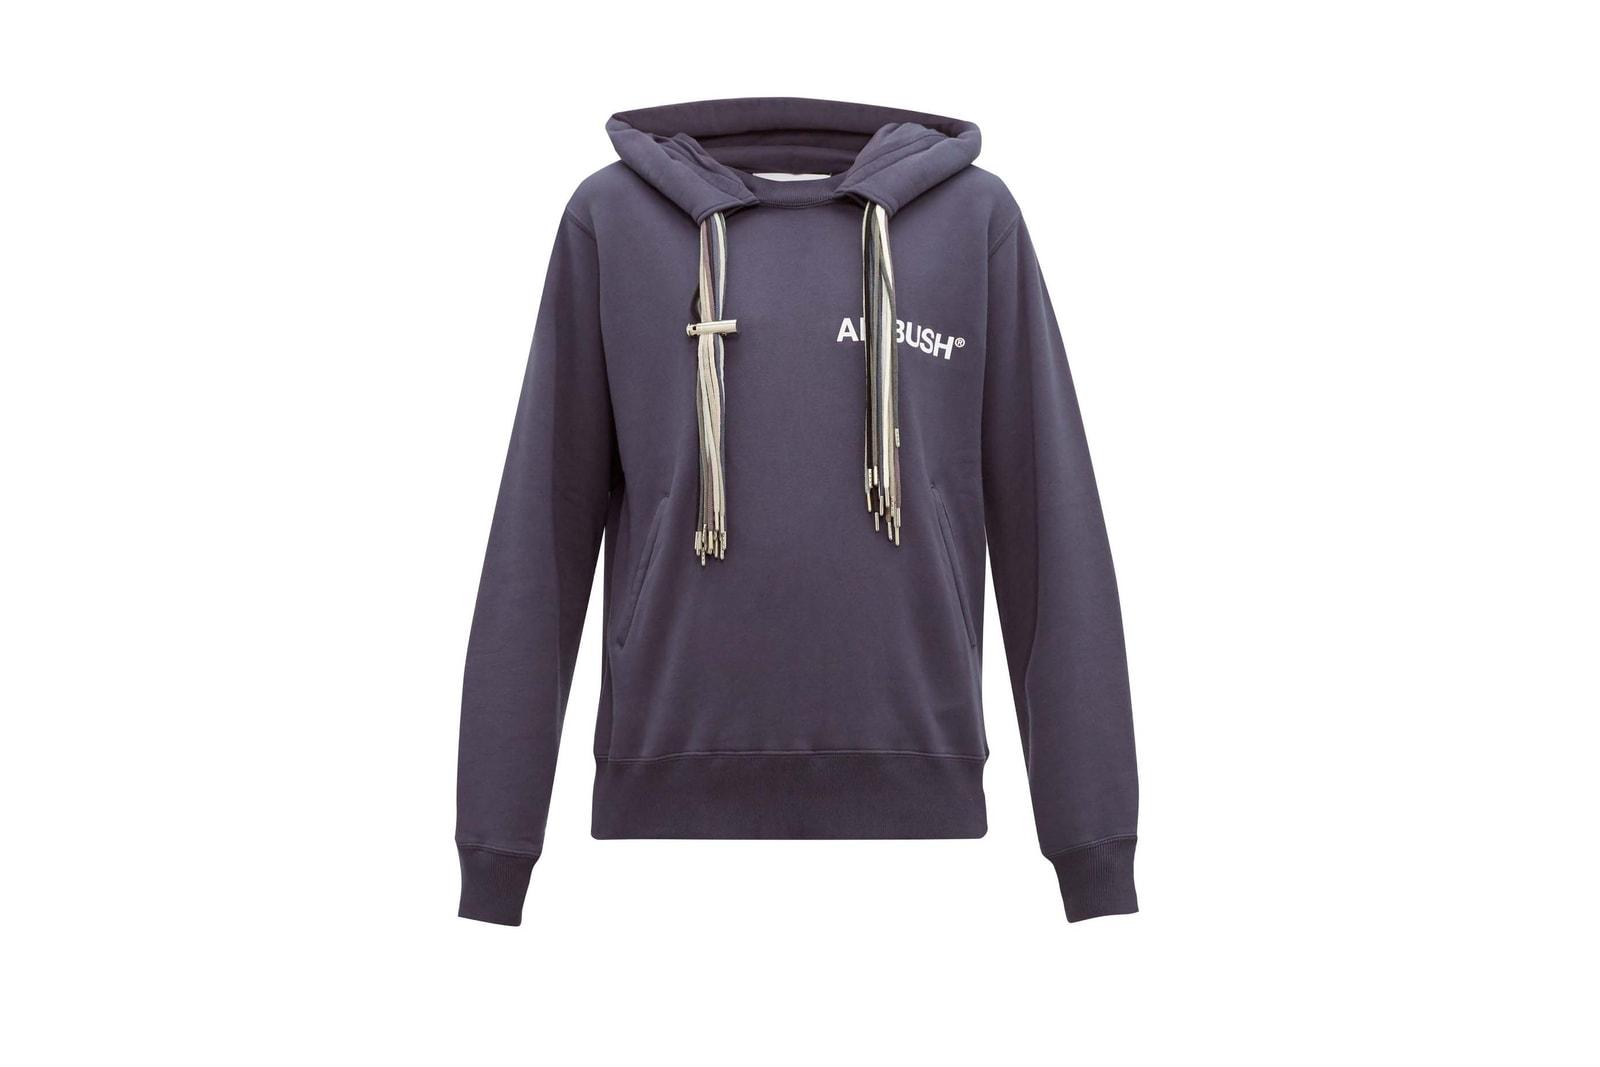 Photo hoodie shopping